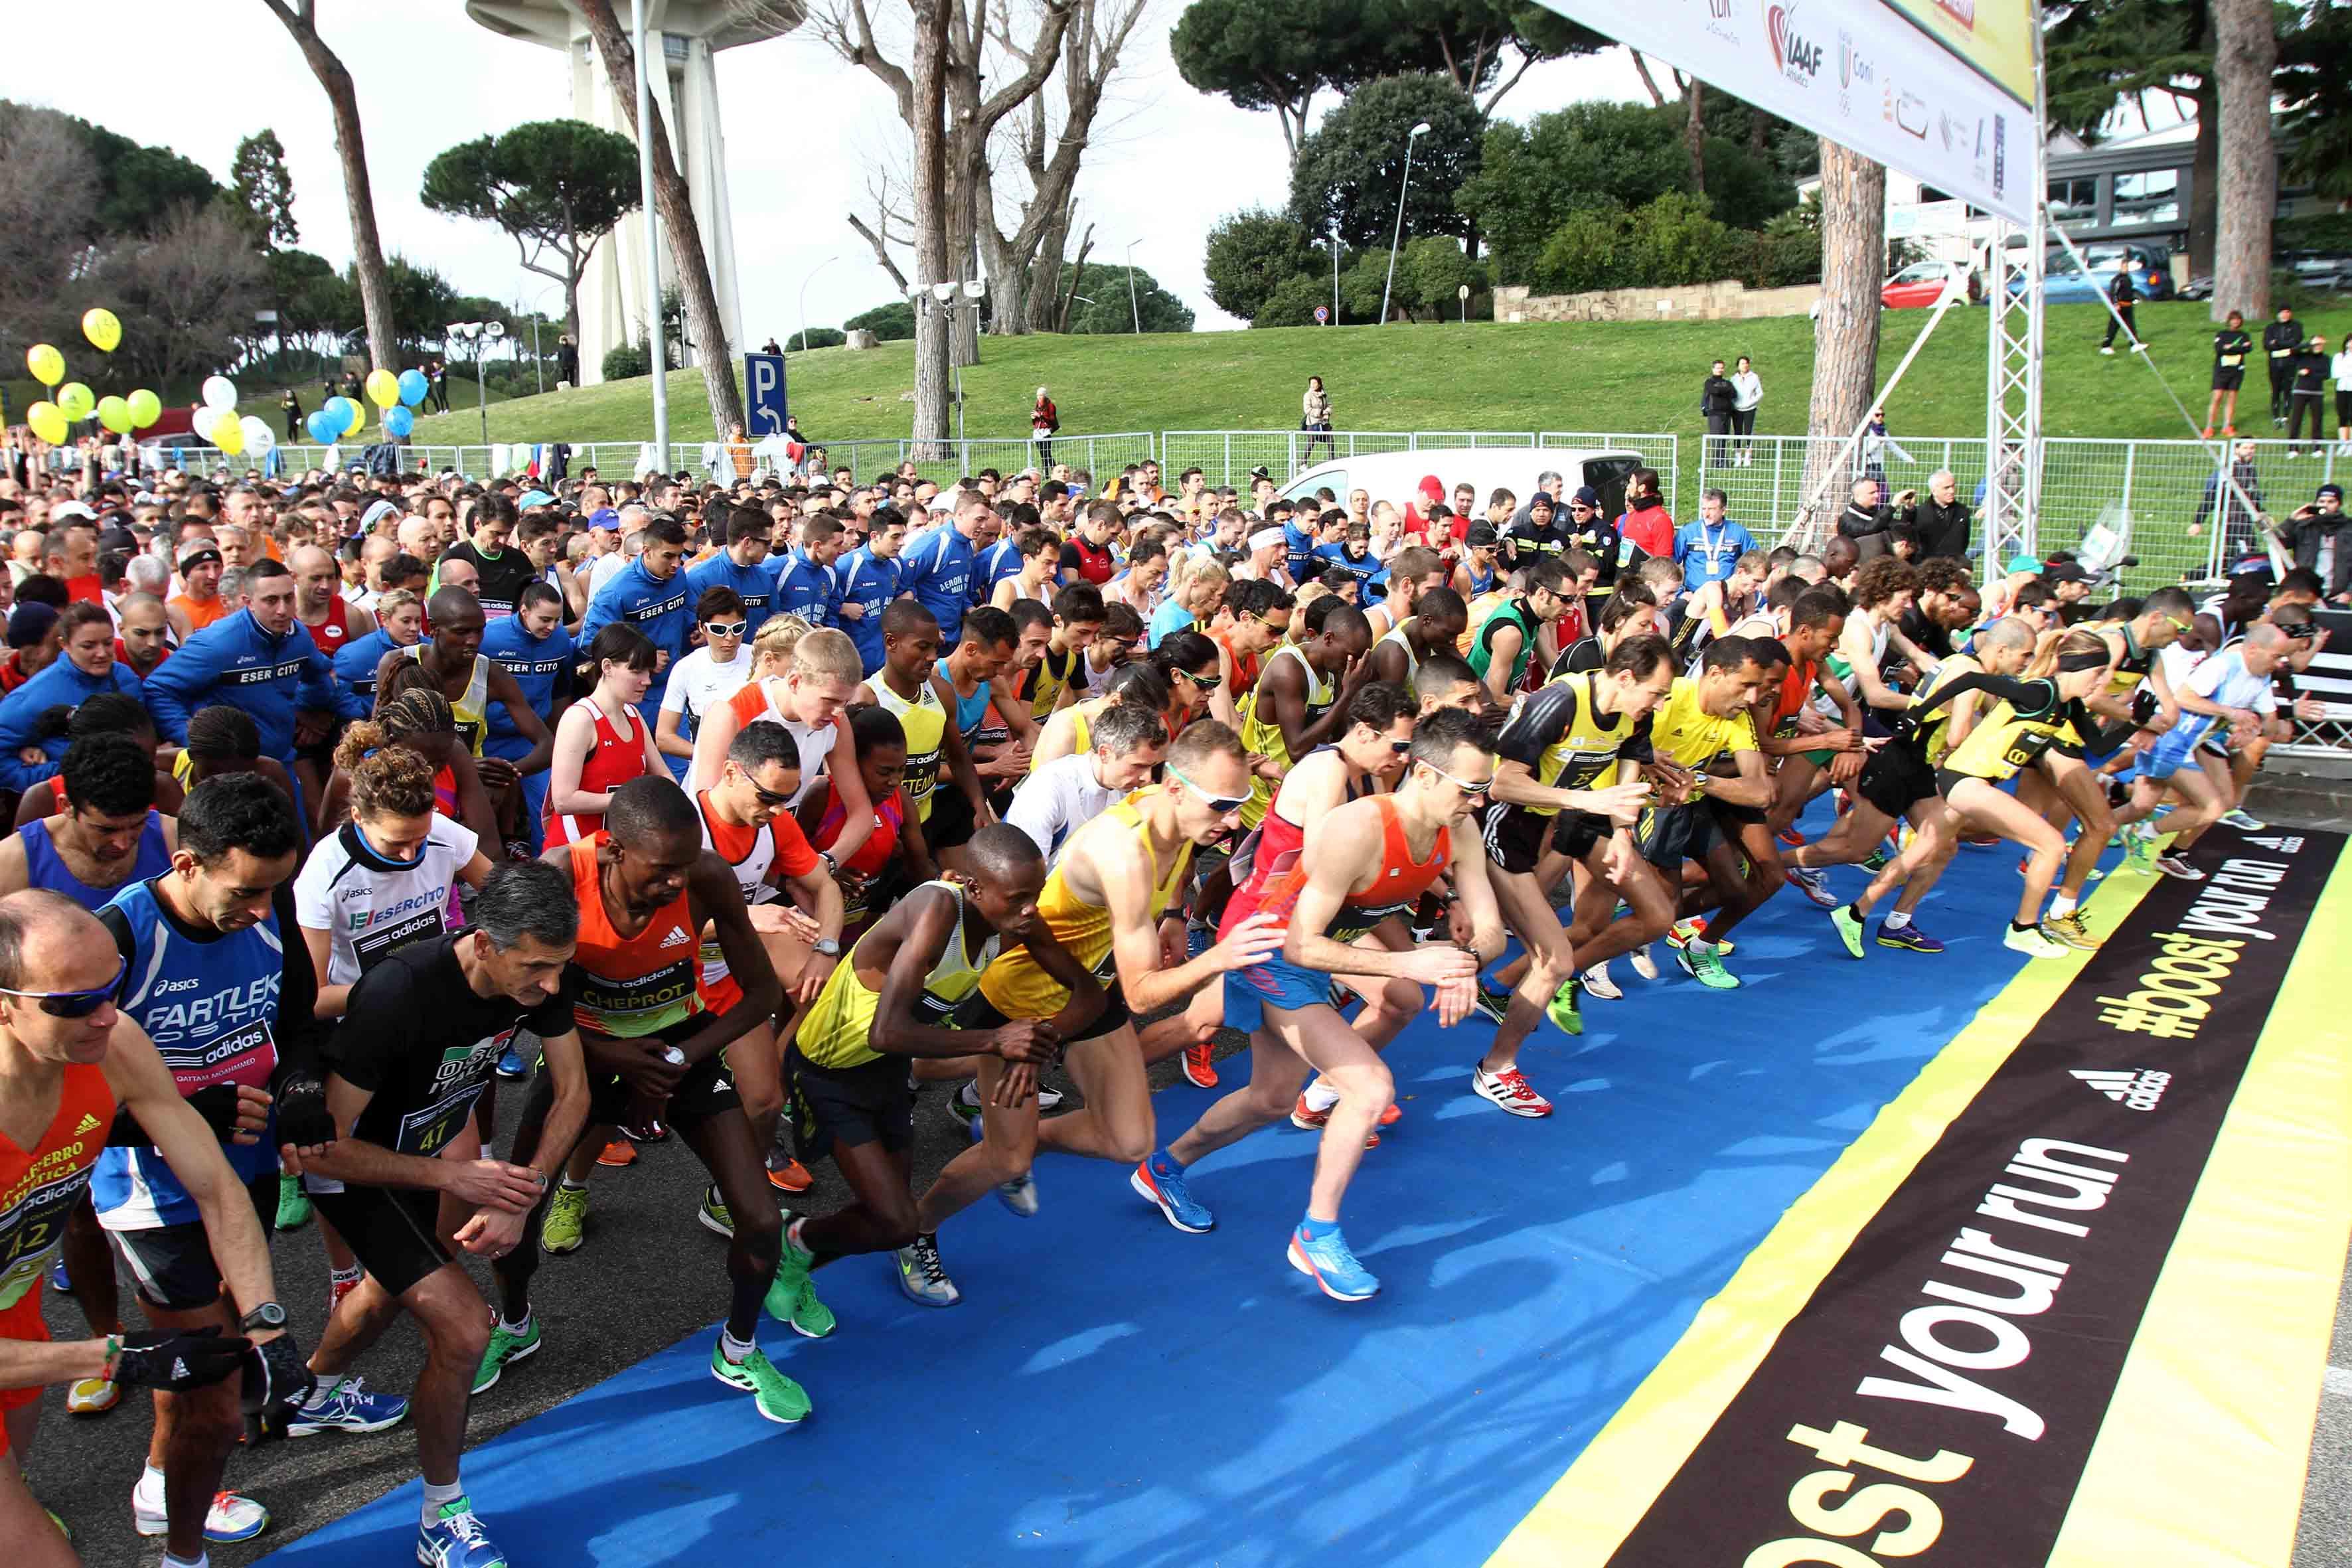 Programma ostia half marathon 2015 for Programma arredamenti ostia